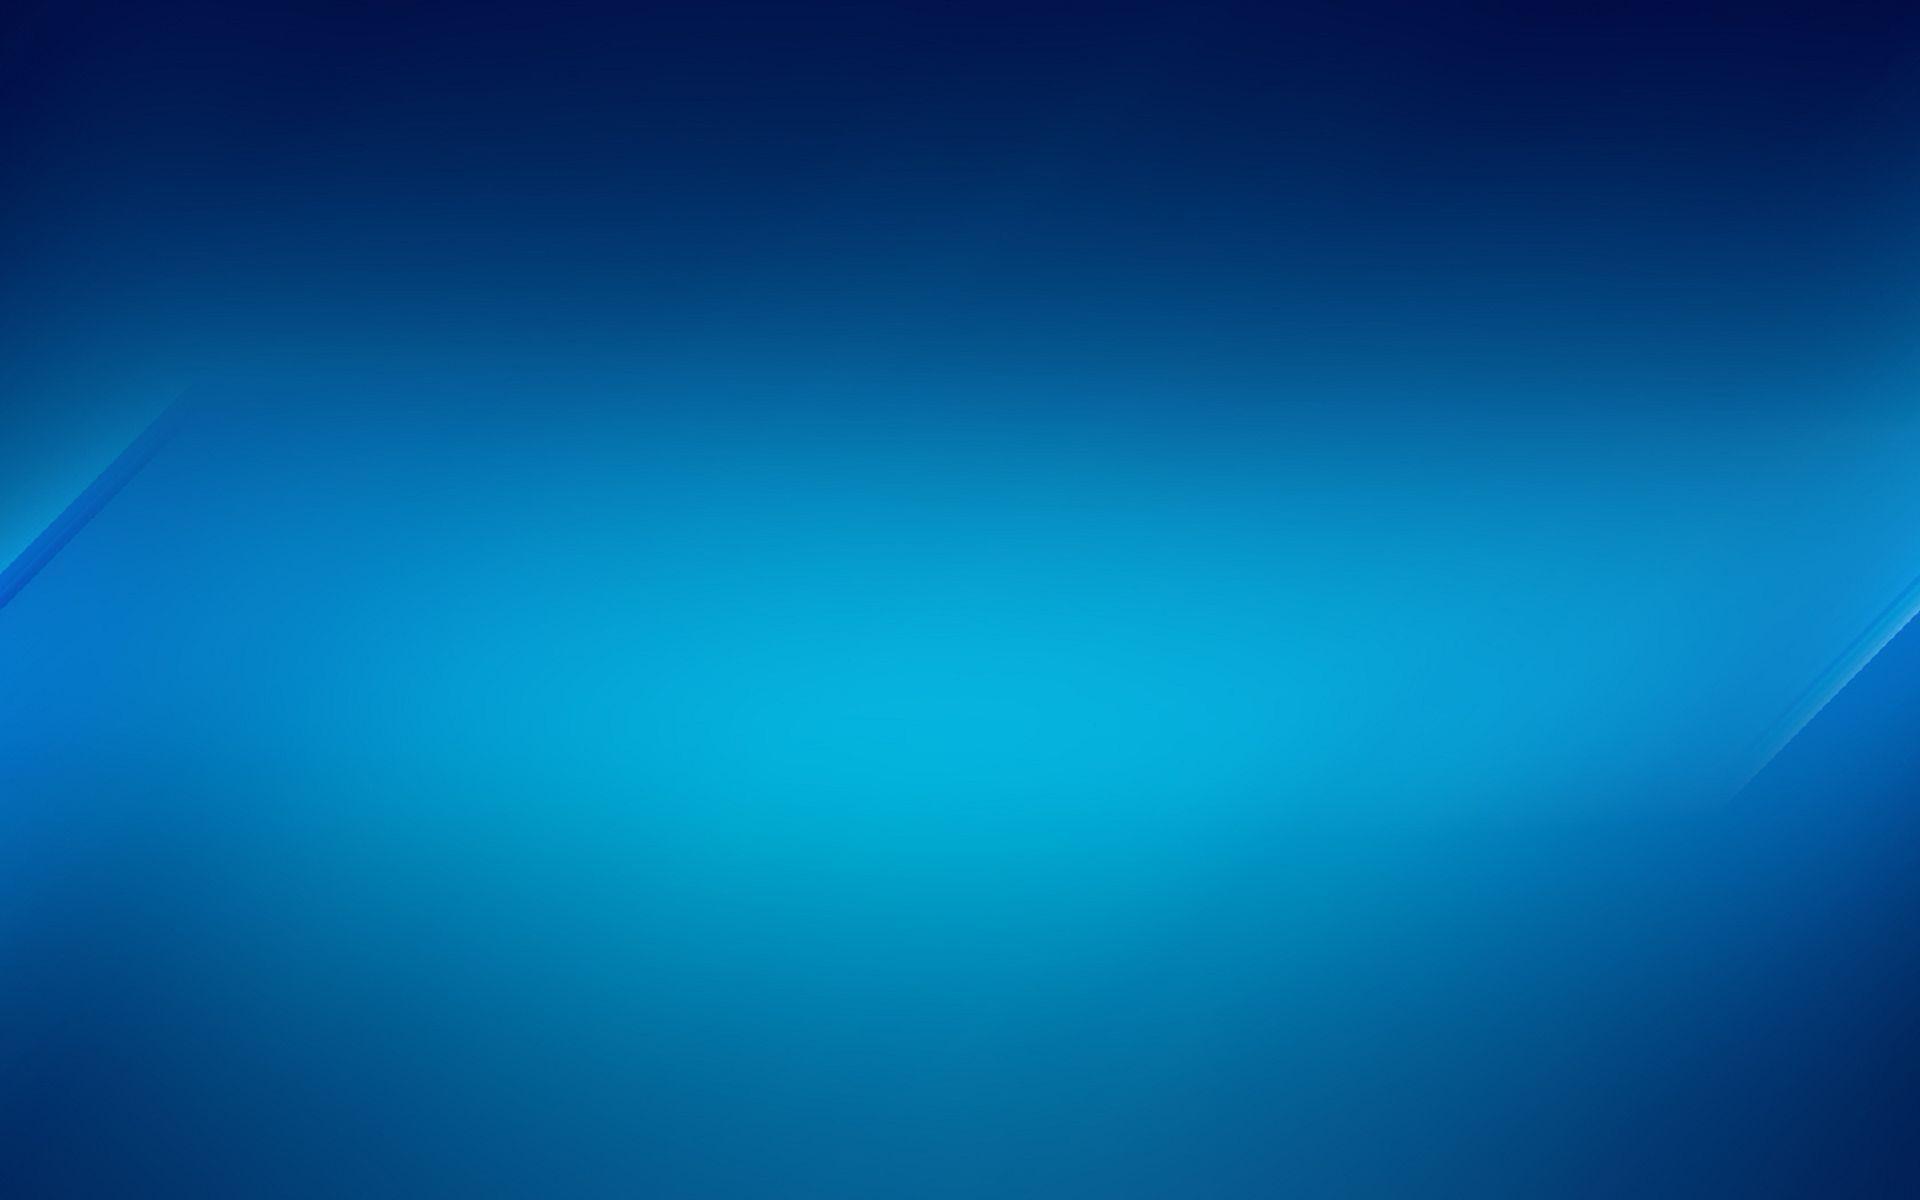 Unduh 650+ Wallpaper Hd Biru Paling Keren